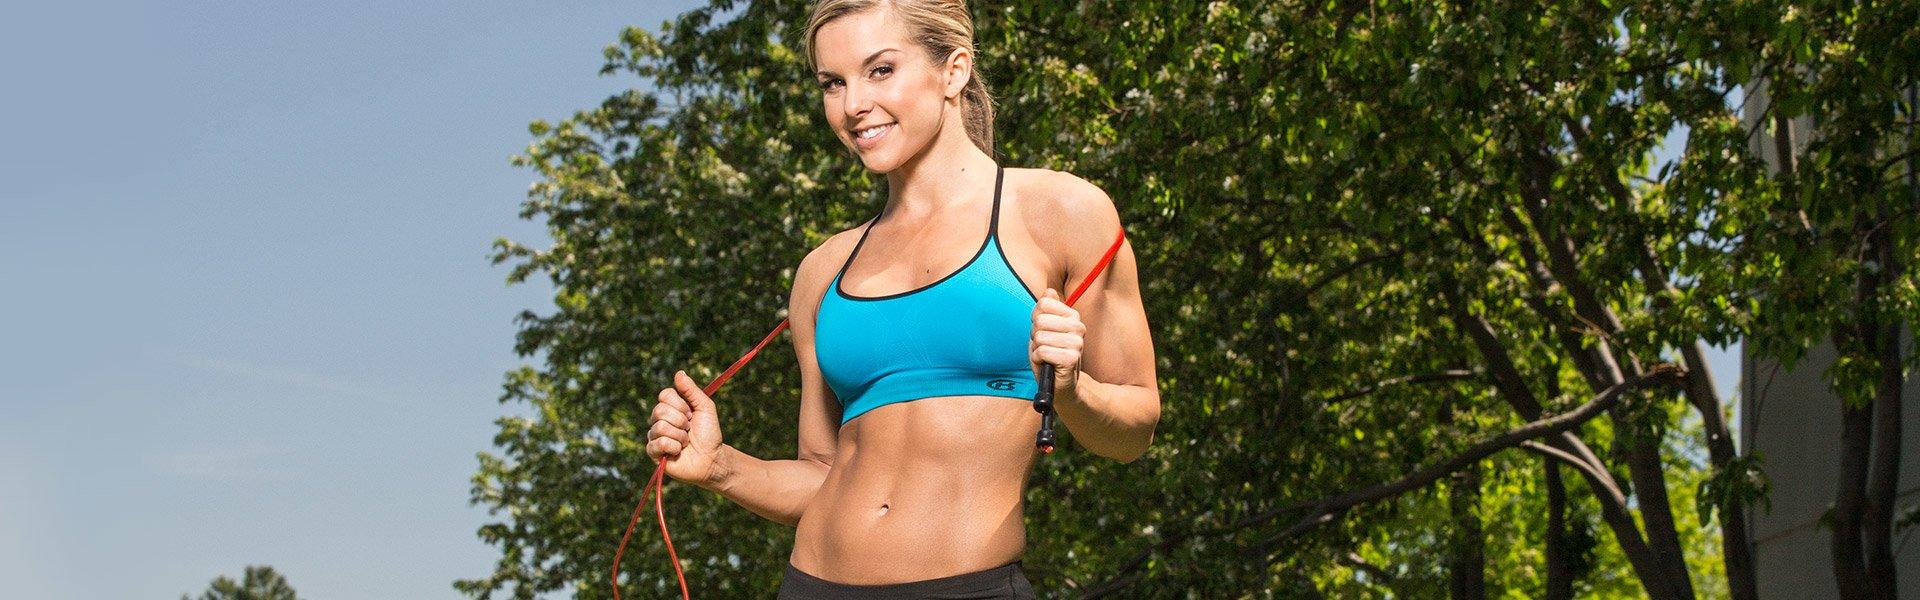 dexedrine vs vyvanse weight loss